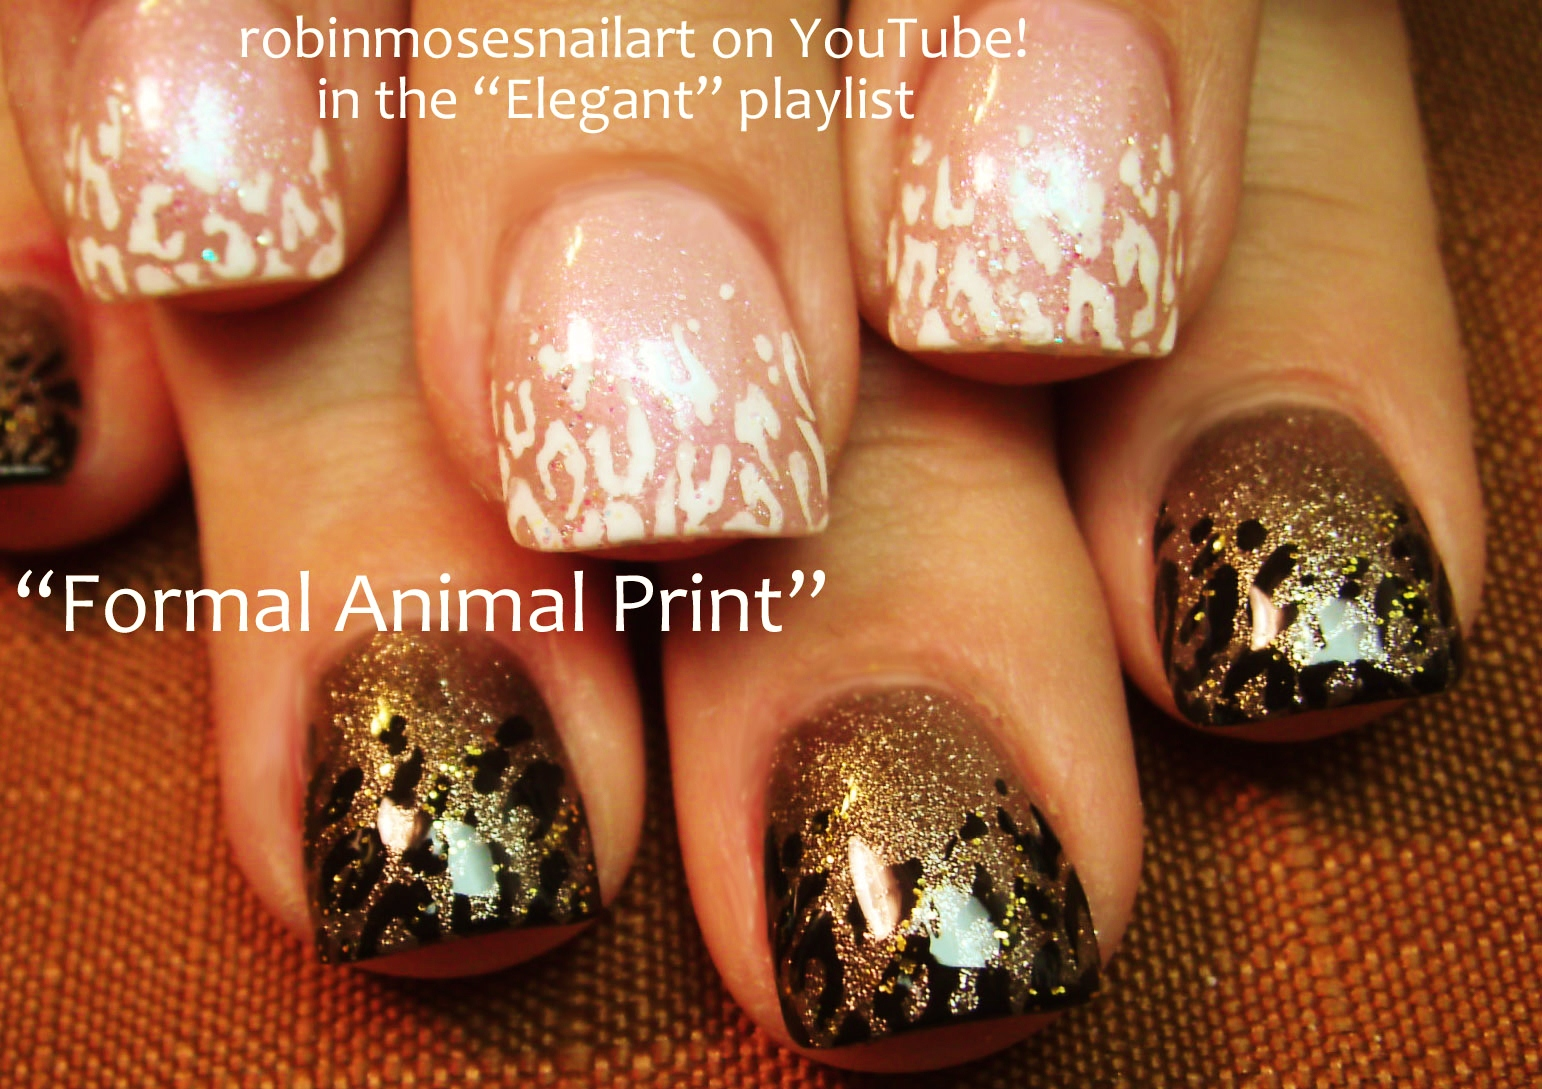 Robin moses nail art leopard print nails design tutorials fall animal print nail art playlist easy nail art tutorials diy zebra leopard tiger nail designs prinsesfo Images